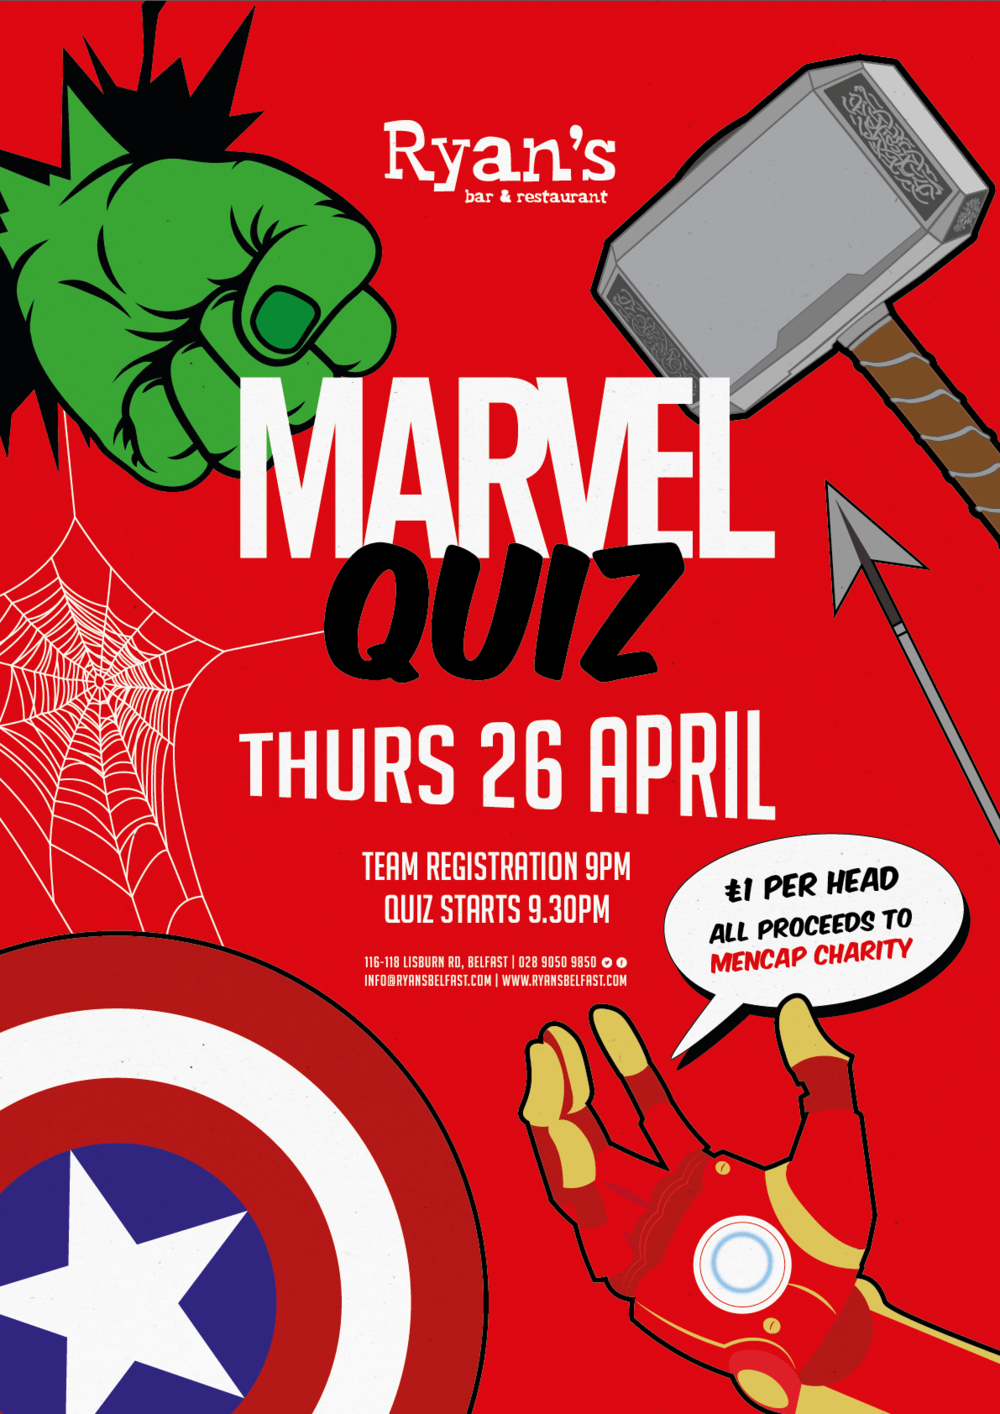 Ryans_Marvel-Quiz-18.png